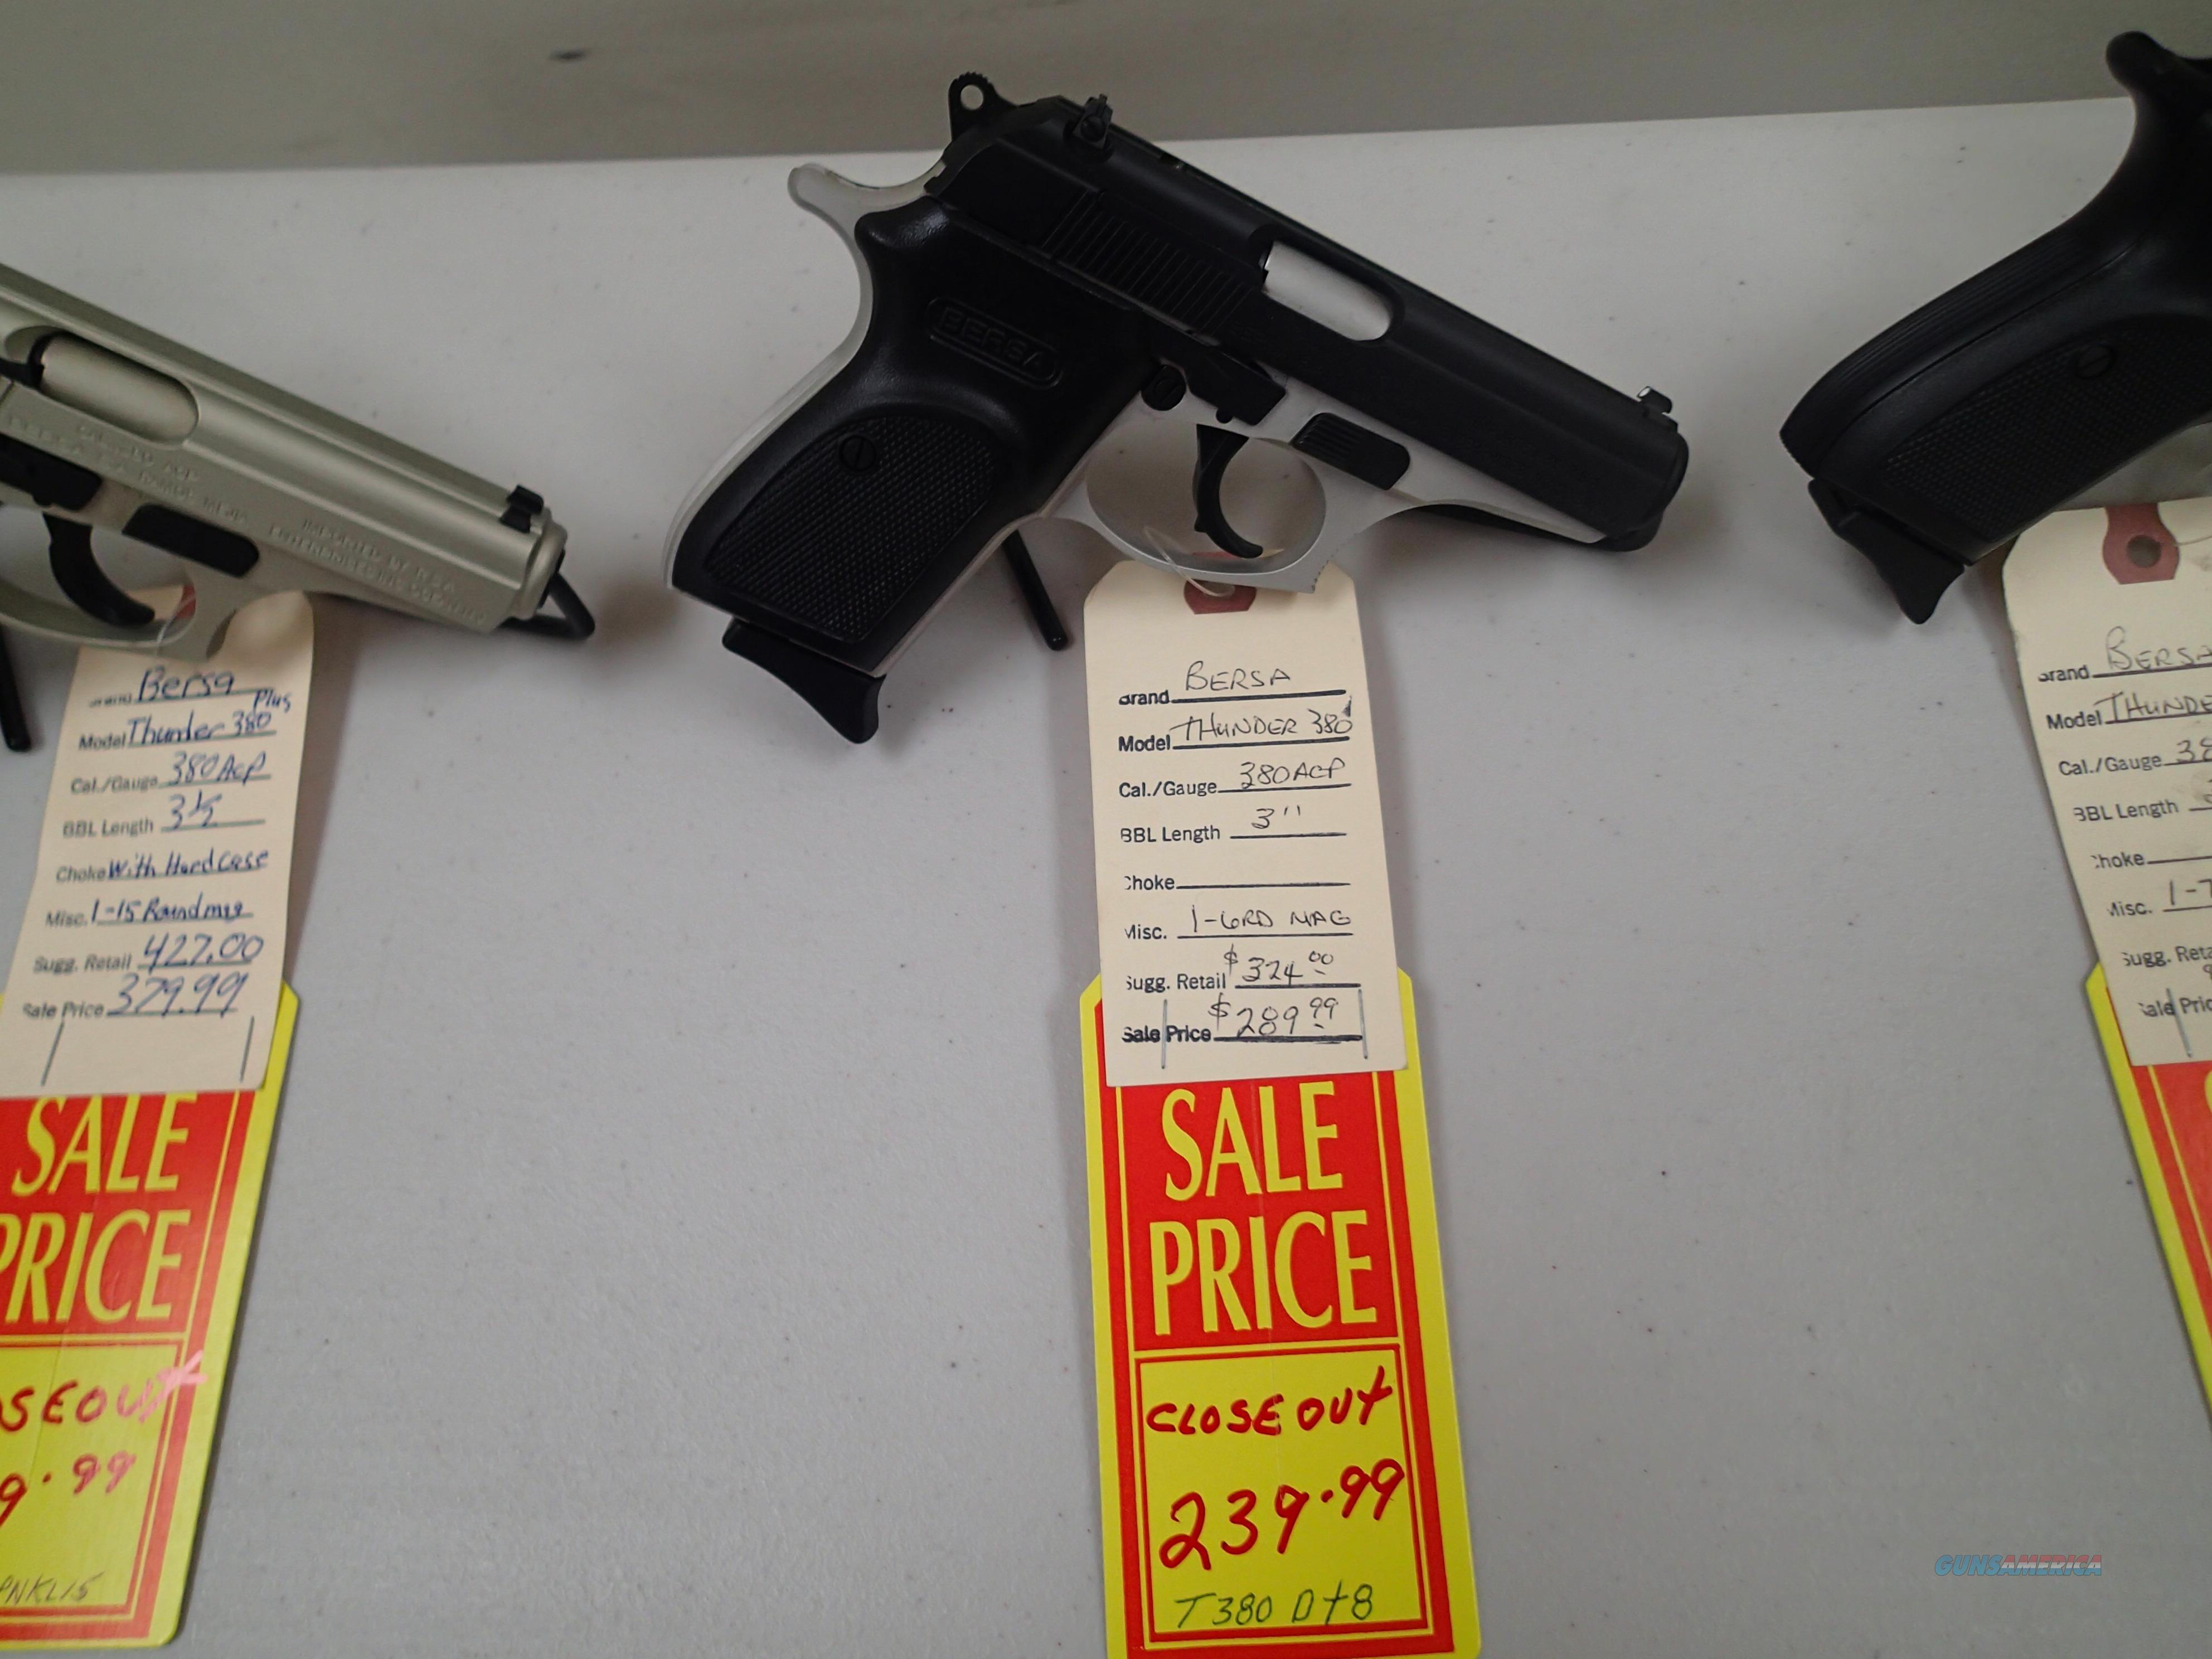 Bersa Thunder 380 Two Tone 1-7rd mag NIB closeout prices (96021)  Guns > Pistols > Bersa Pistols